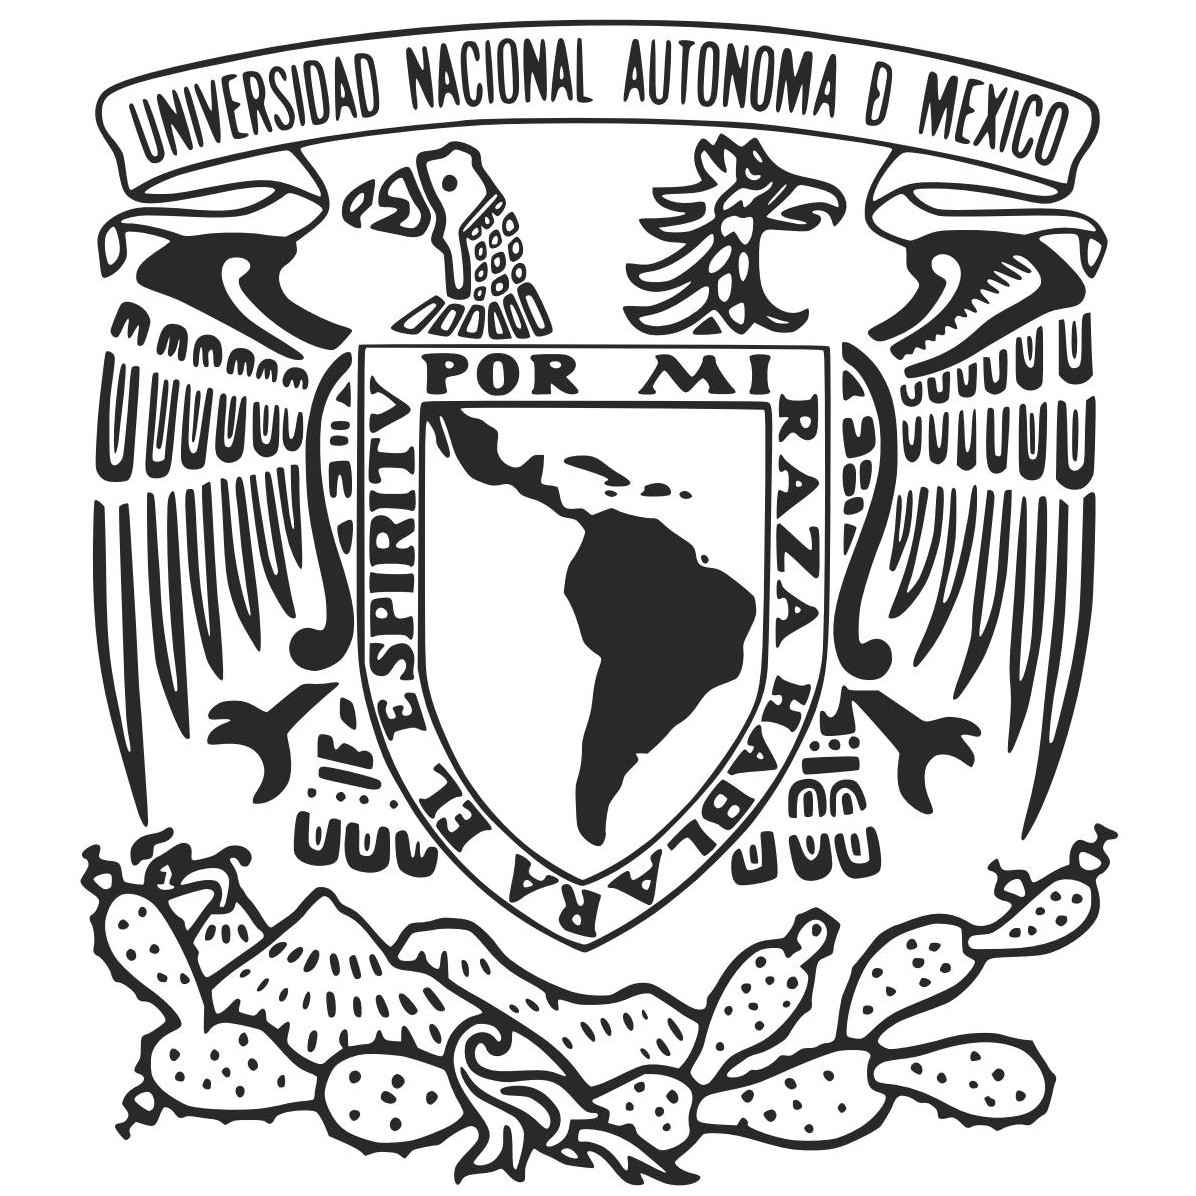 UNAM Logo [National Autonomous University of Mexico.